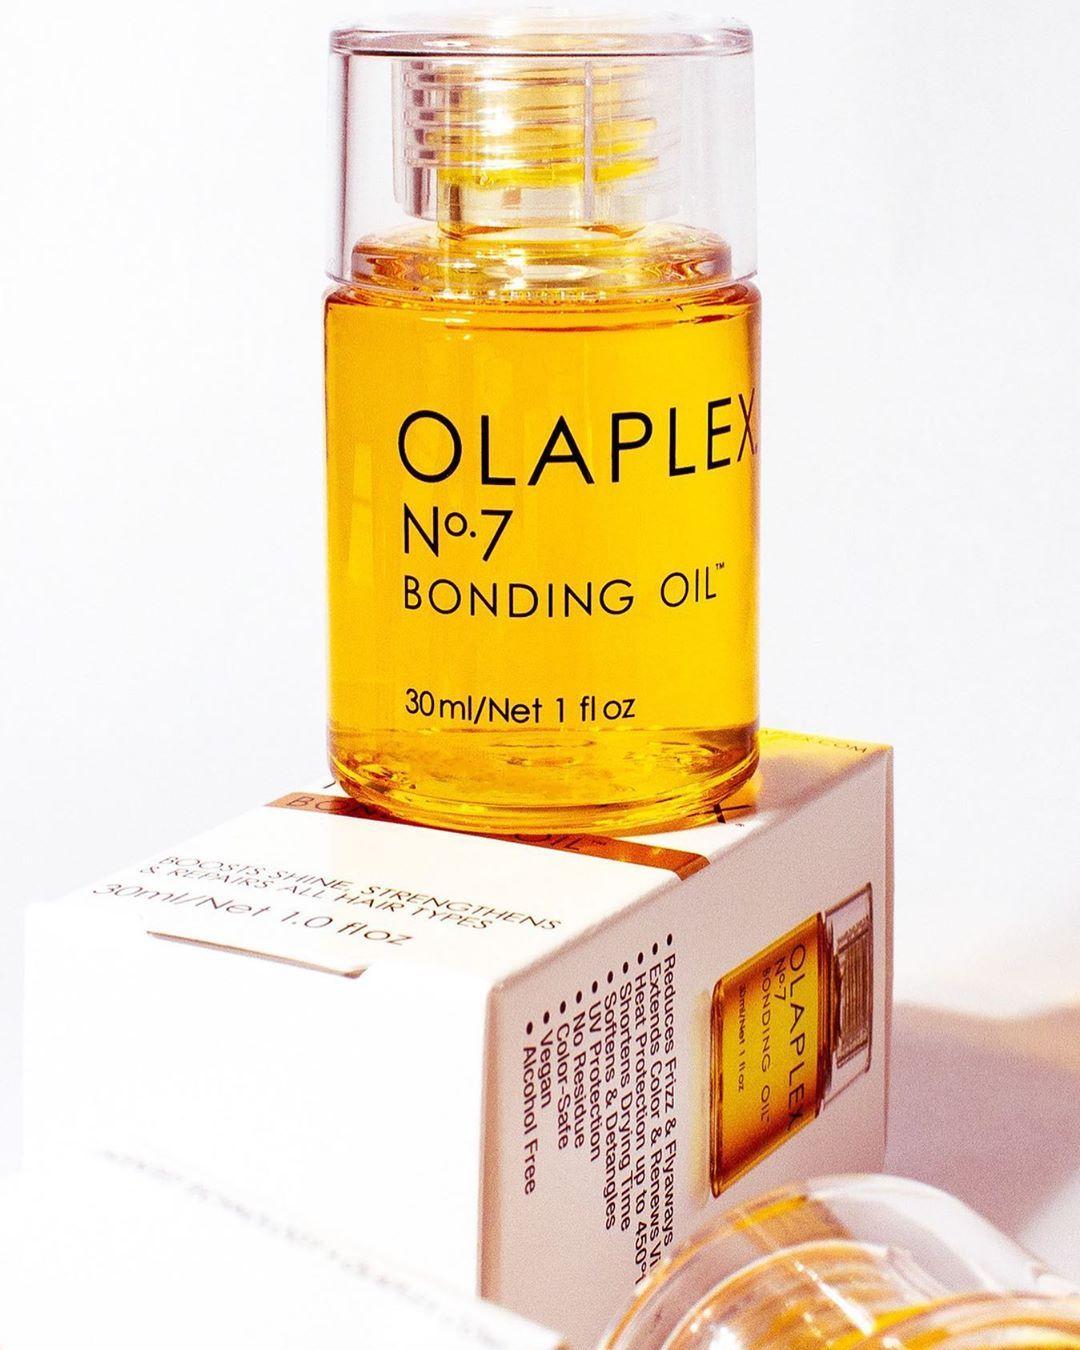 Who's tried olaplex N°.7 Bonding Oil? This lightweight